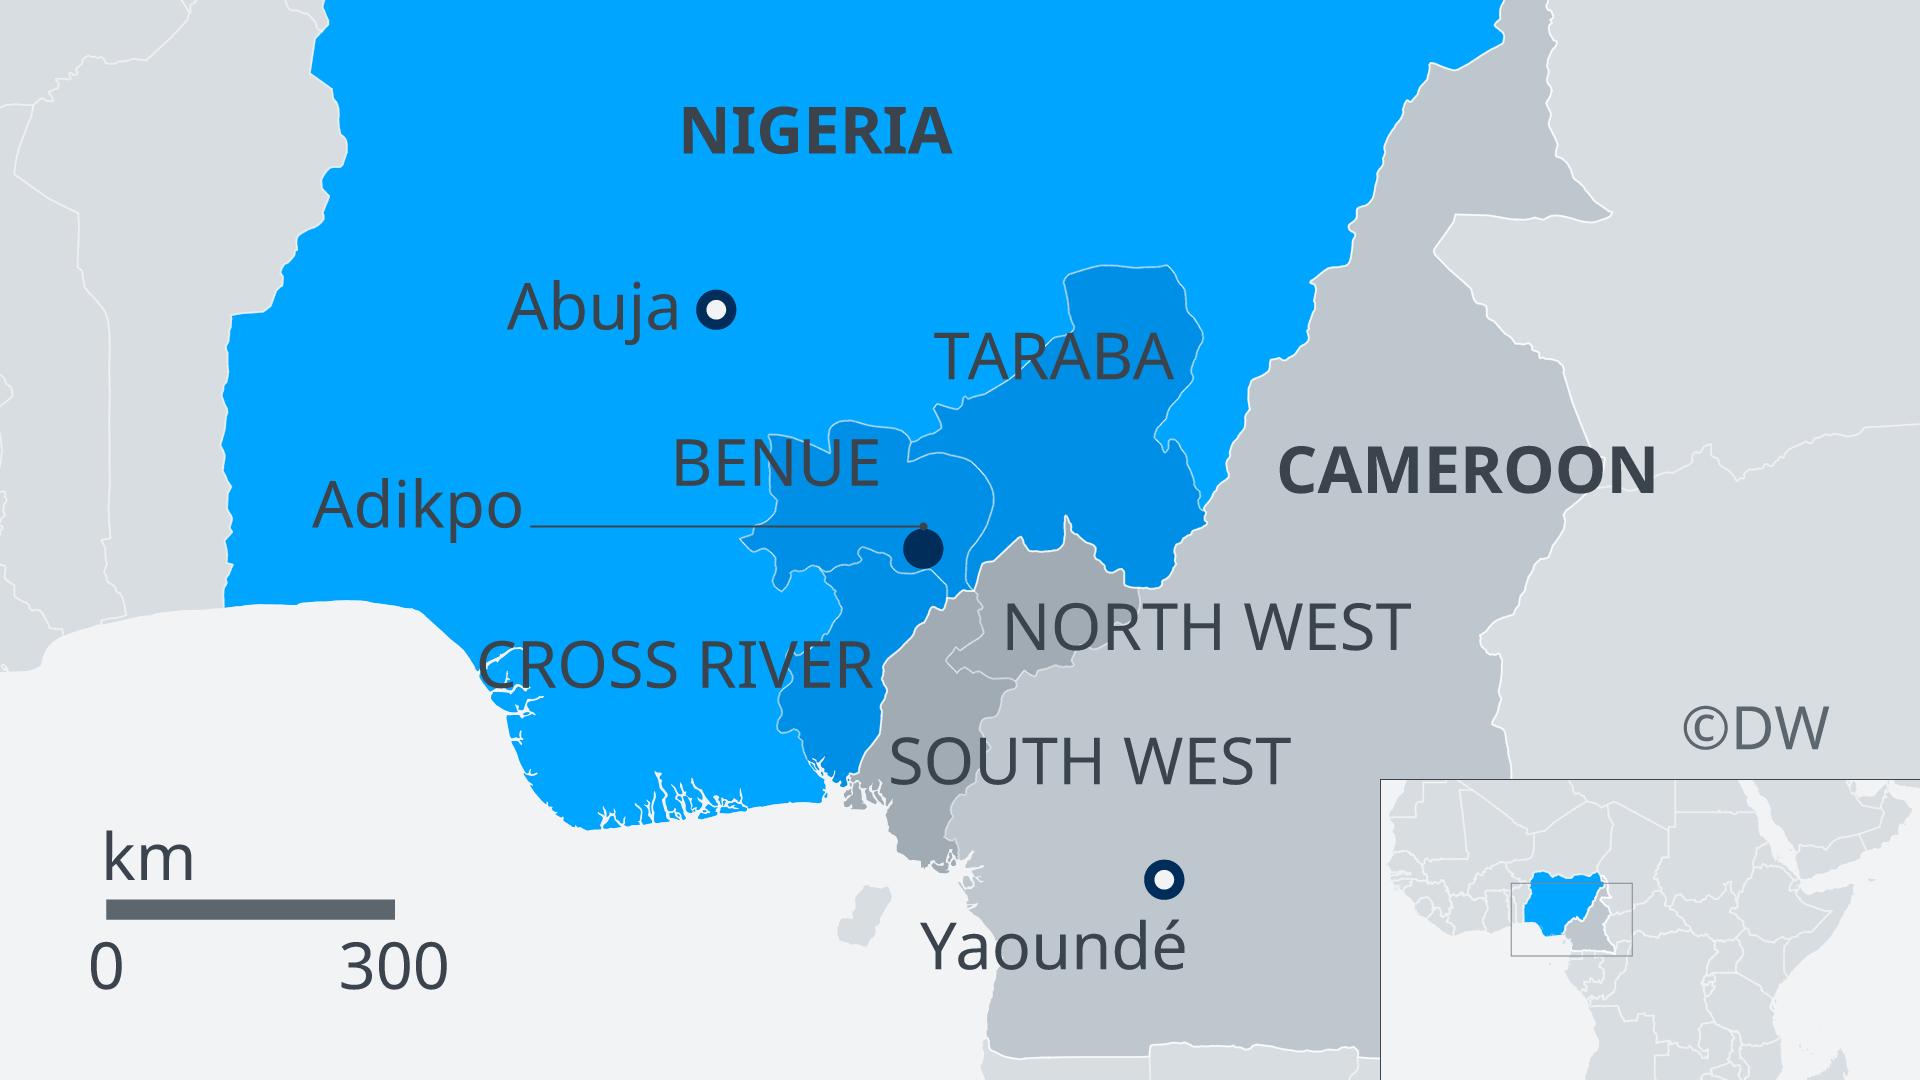 Cameroon′s Paul Biya on shaky ground | Africa | DW | 30.08.2018